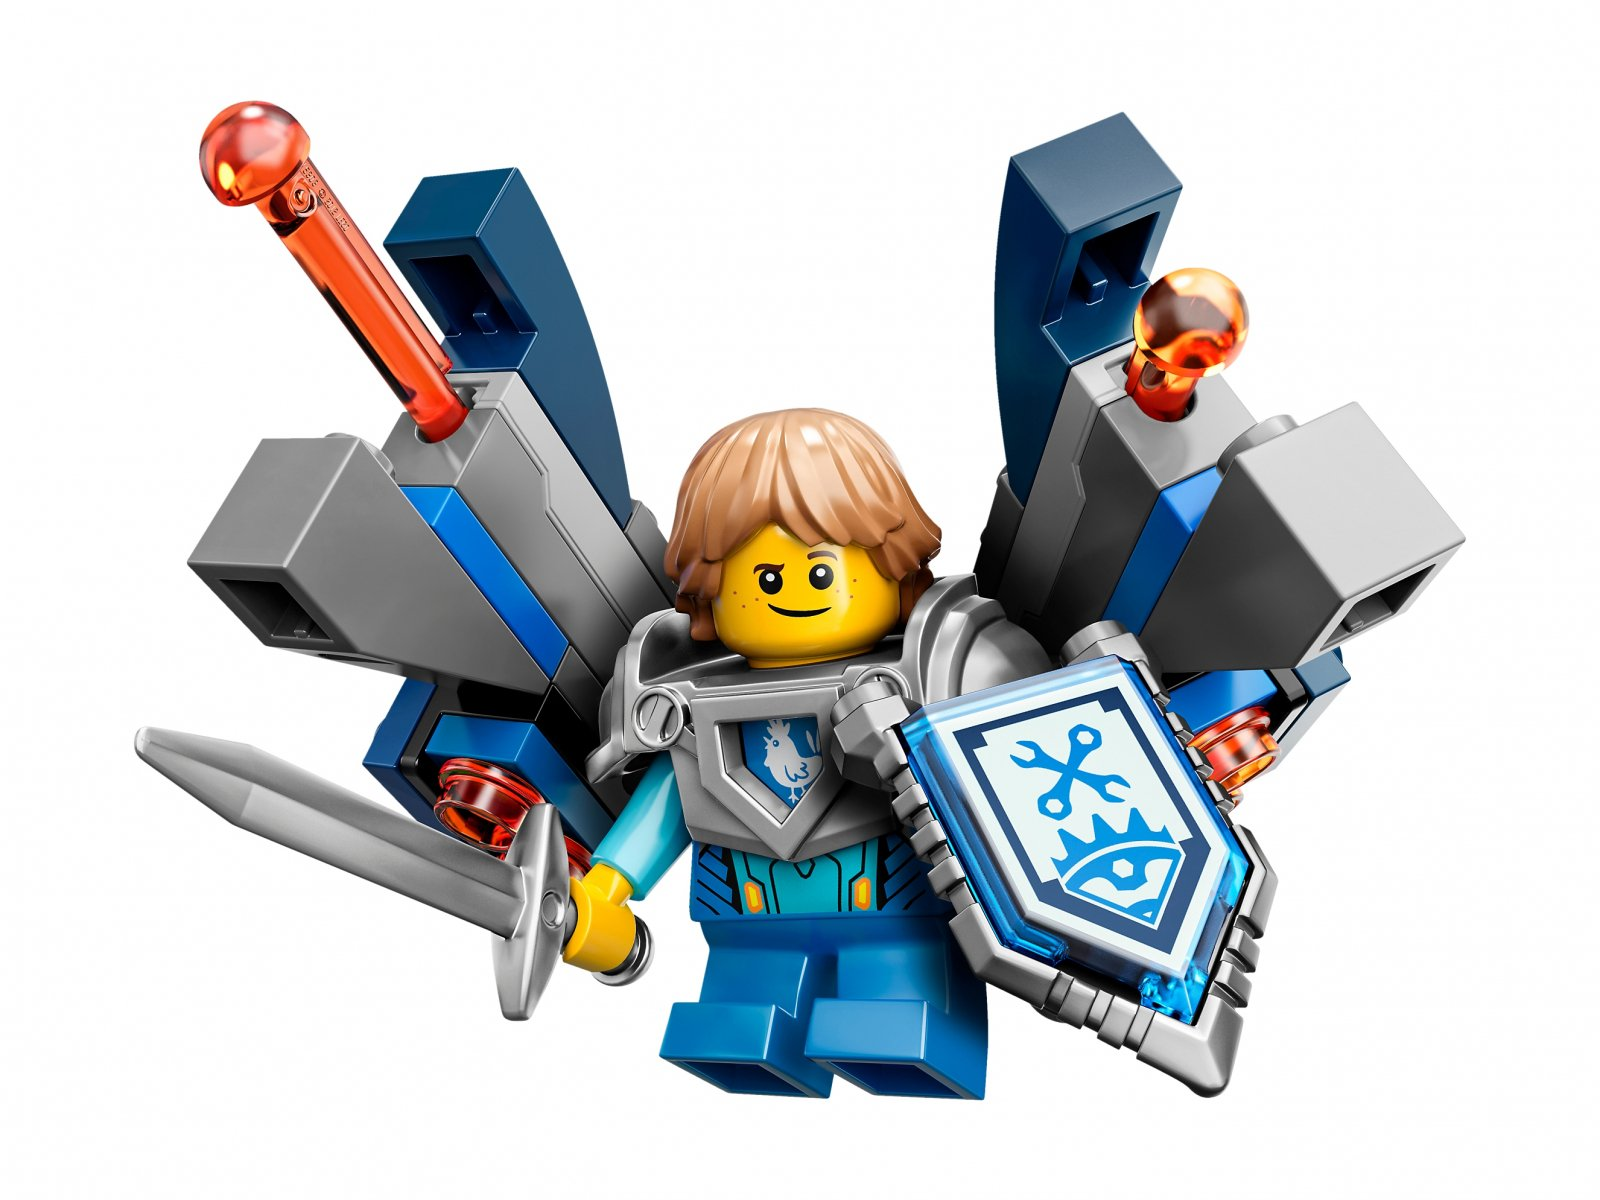 LEGO 70333 Nexo Knights™ Robin